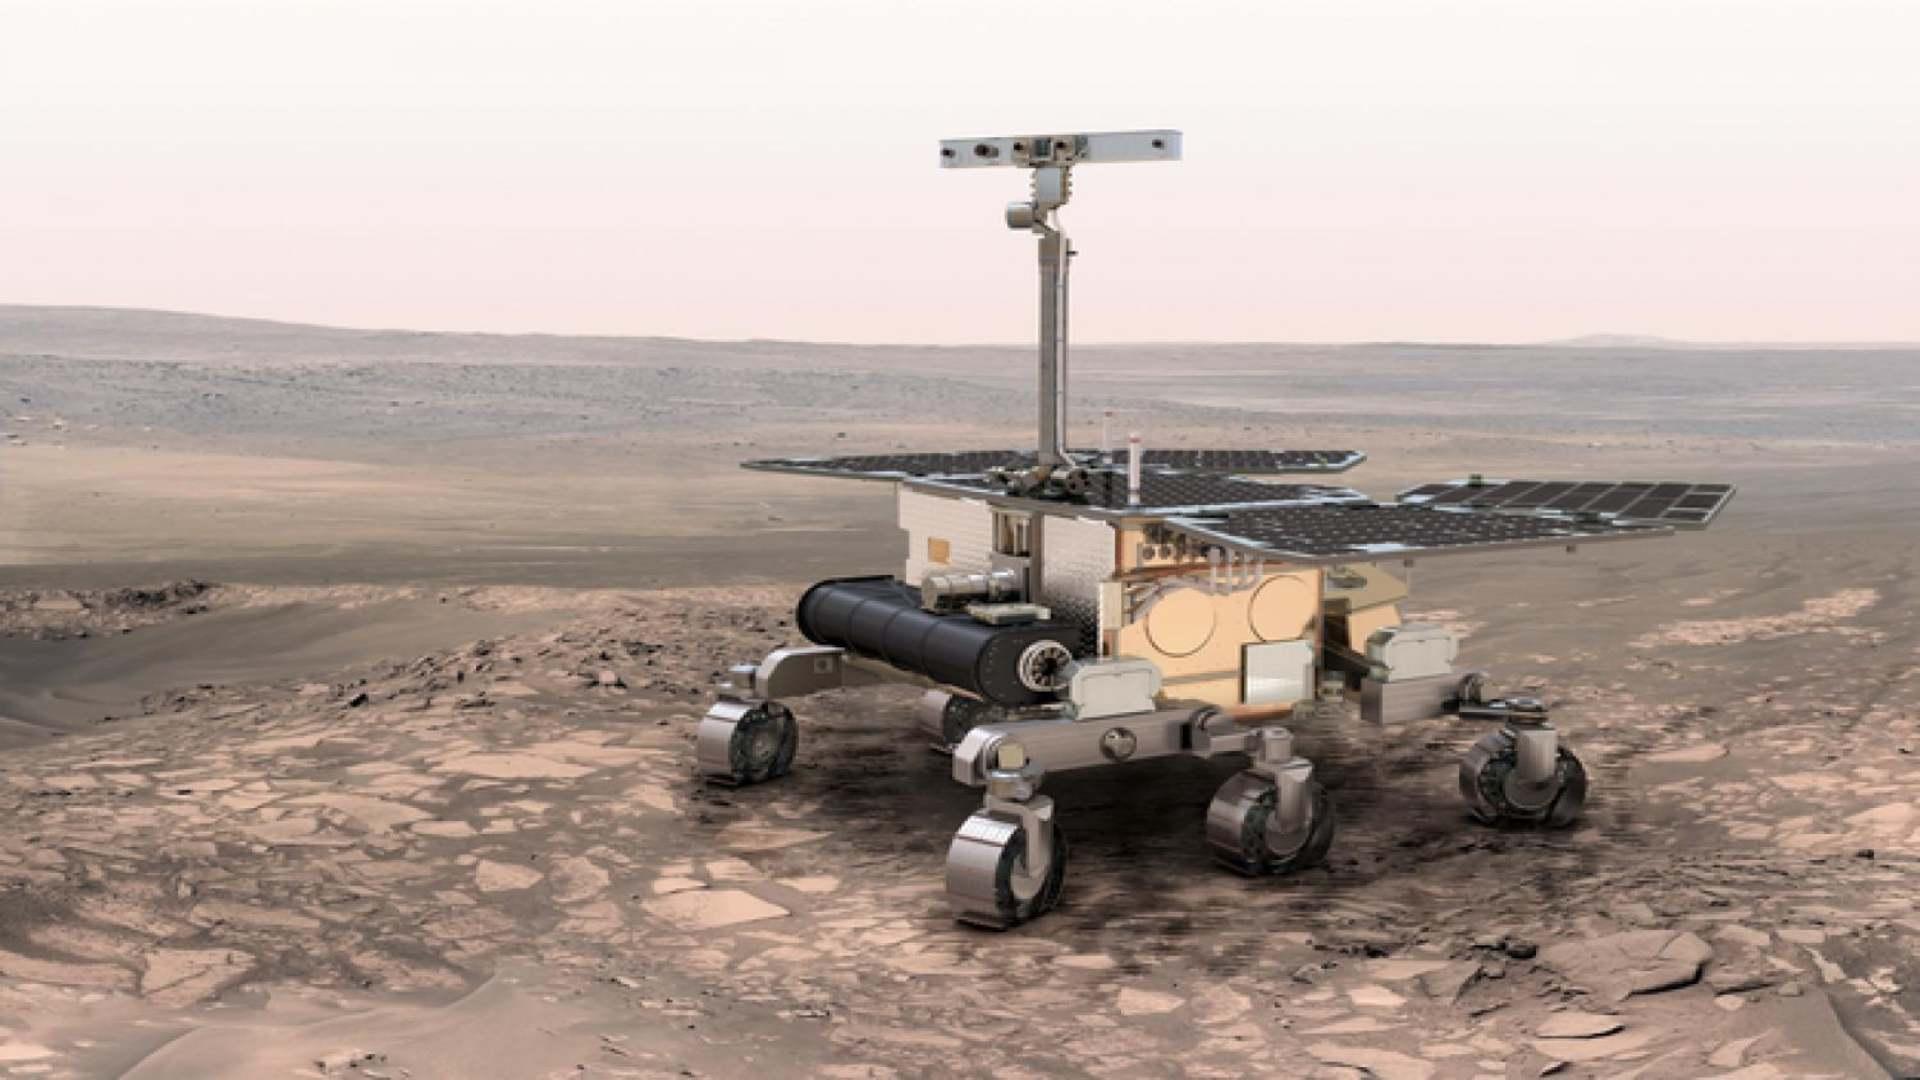 ASI - ExoMars rinviata al 2022